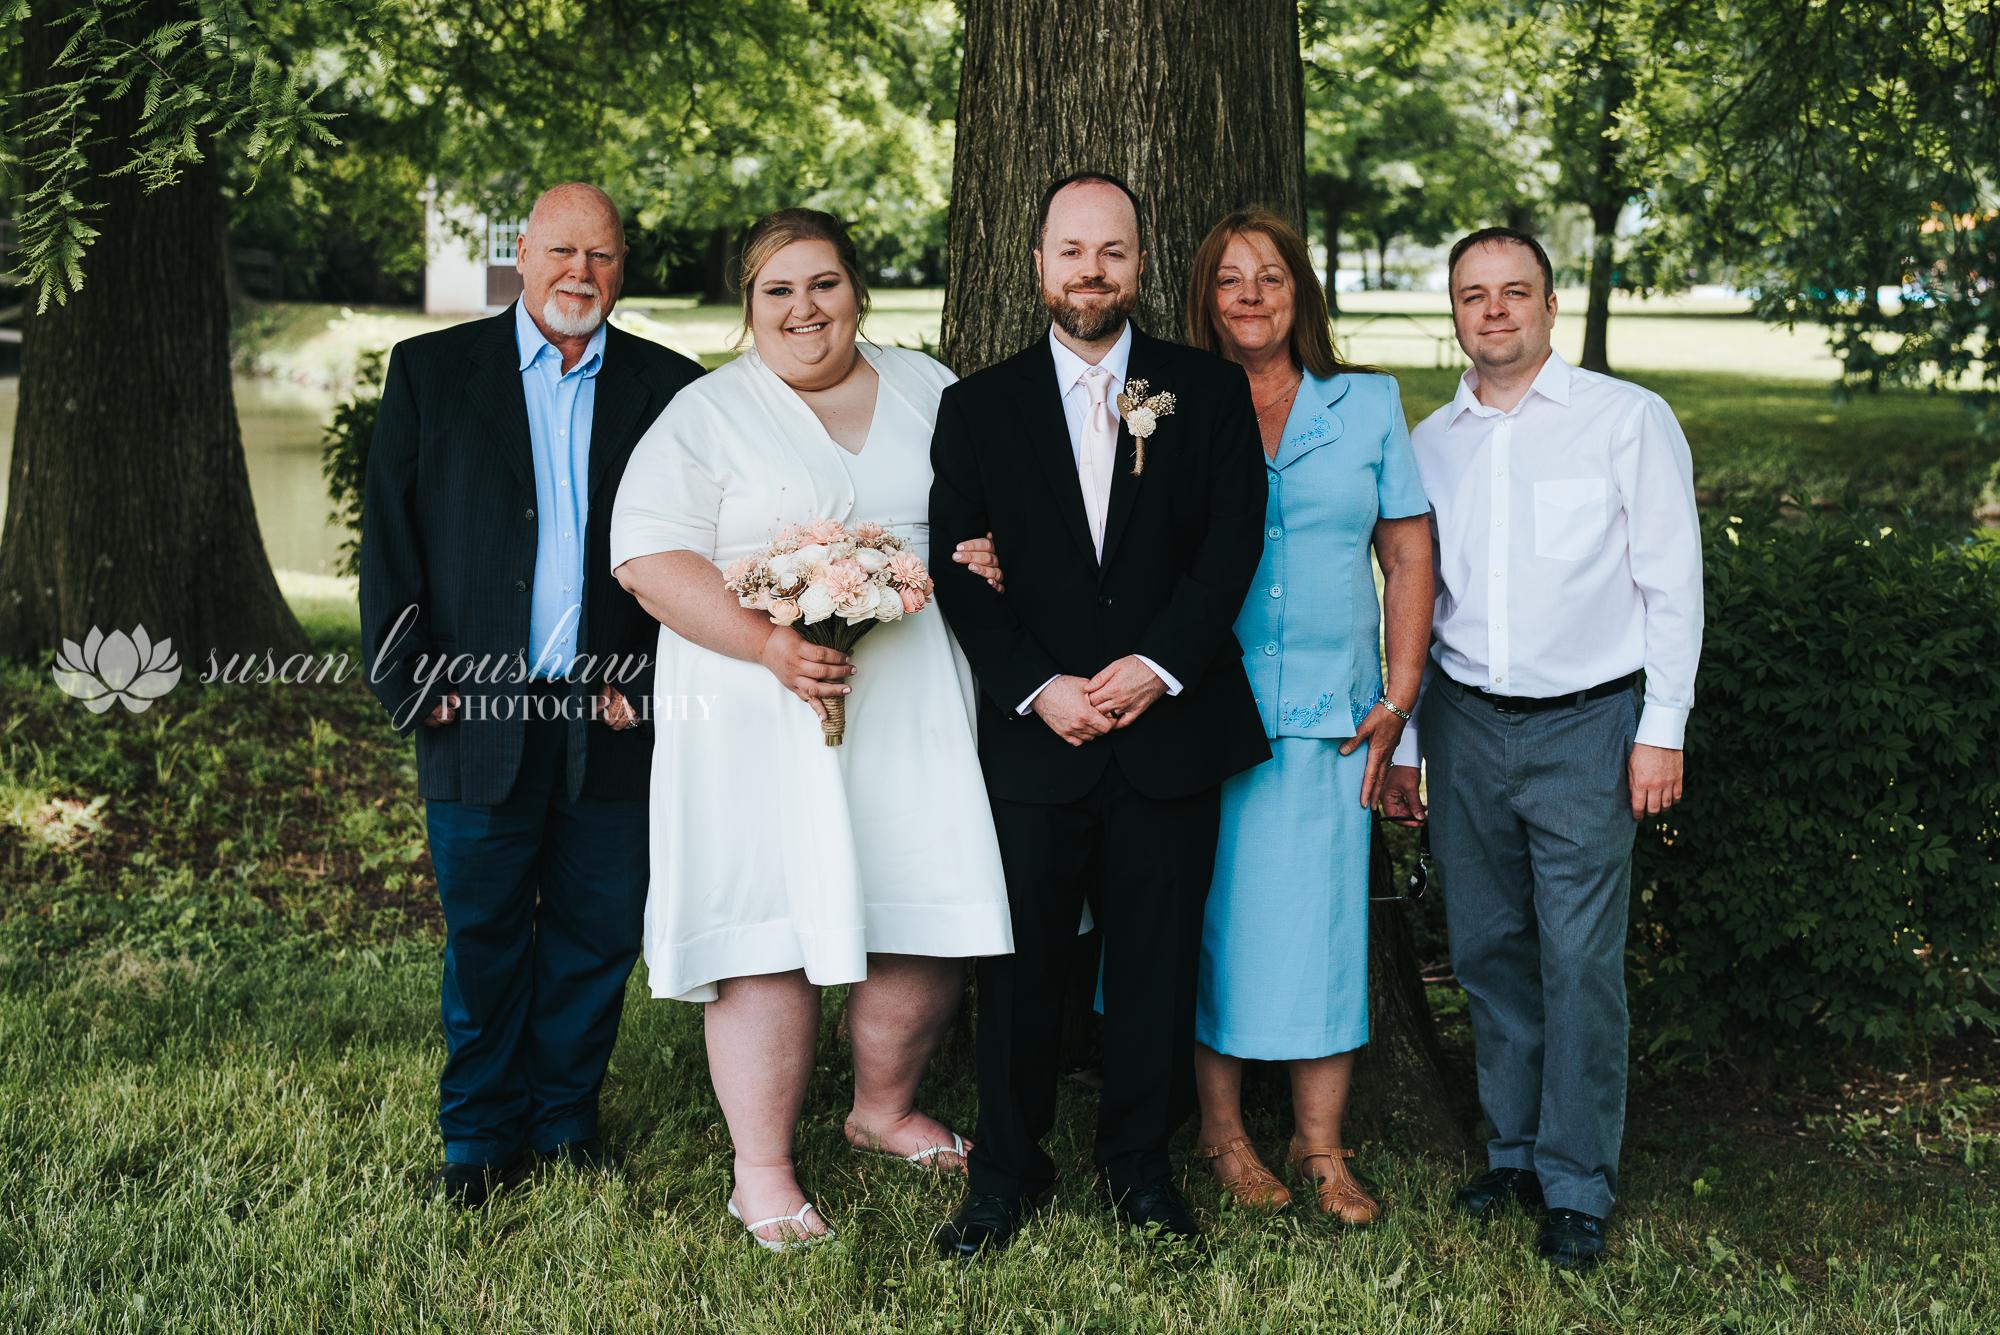 Bill and Sarah Wedding Photos 06-08-2019 SLY Photography -42.jpg